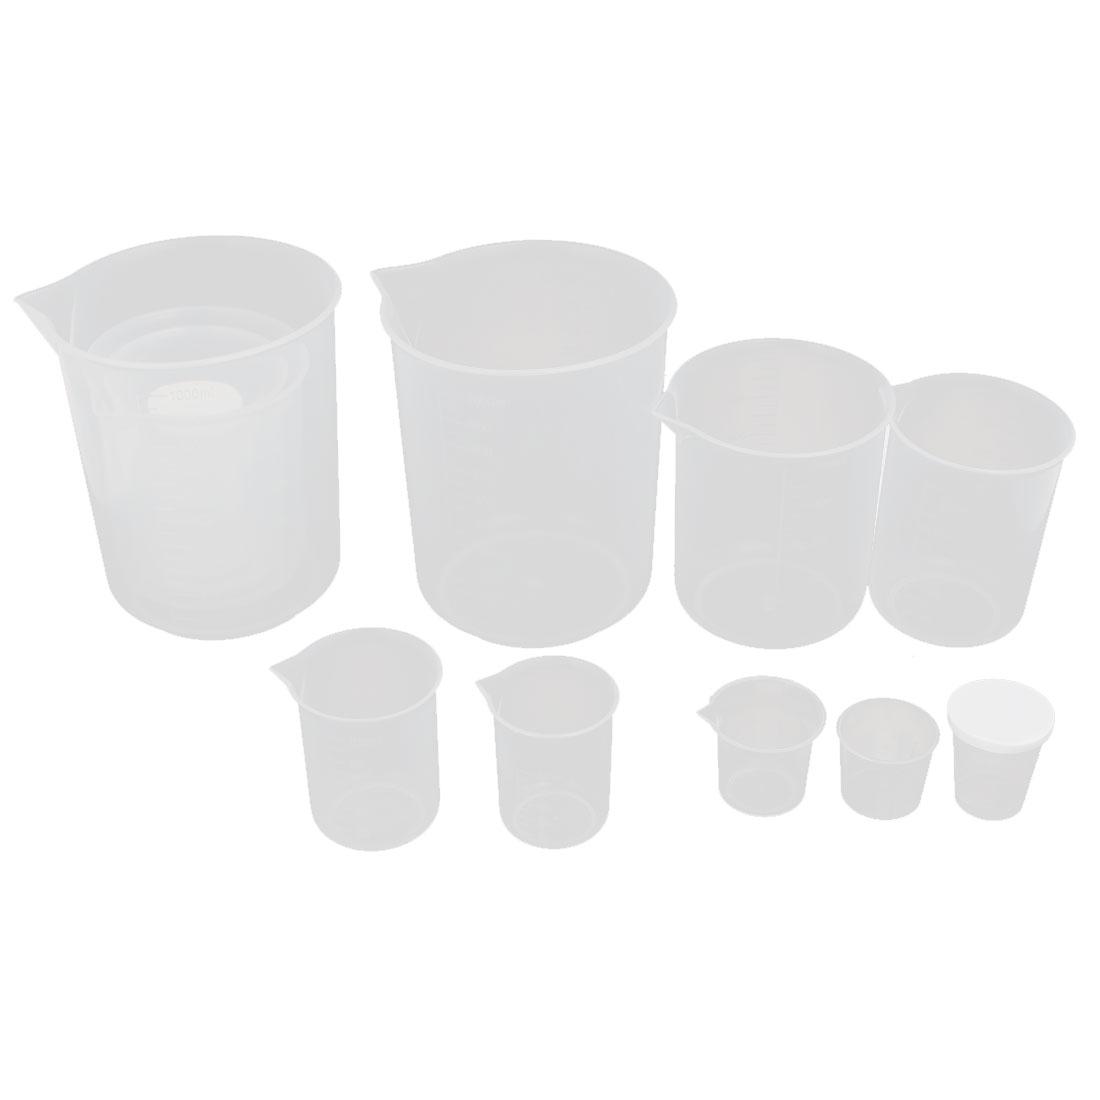 Laboratory Plastic Liquid Container Measuring Cup Beaker 2 Sets